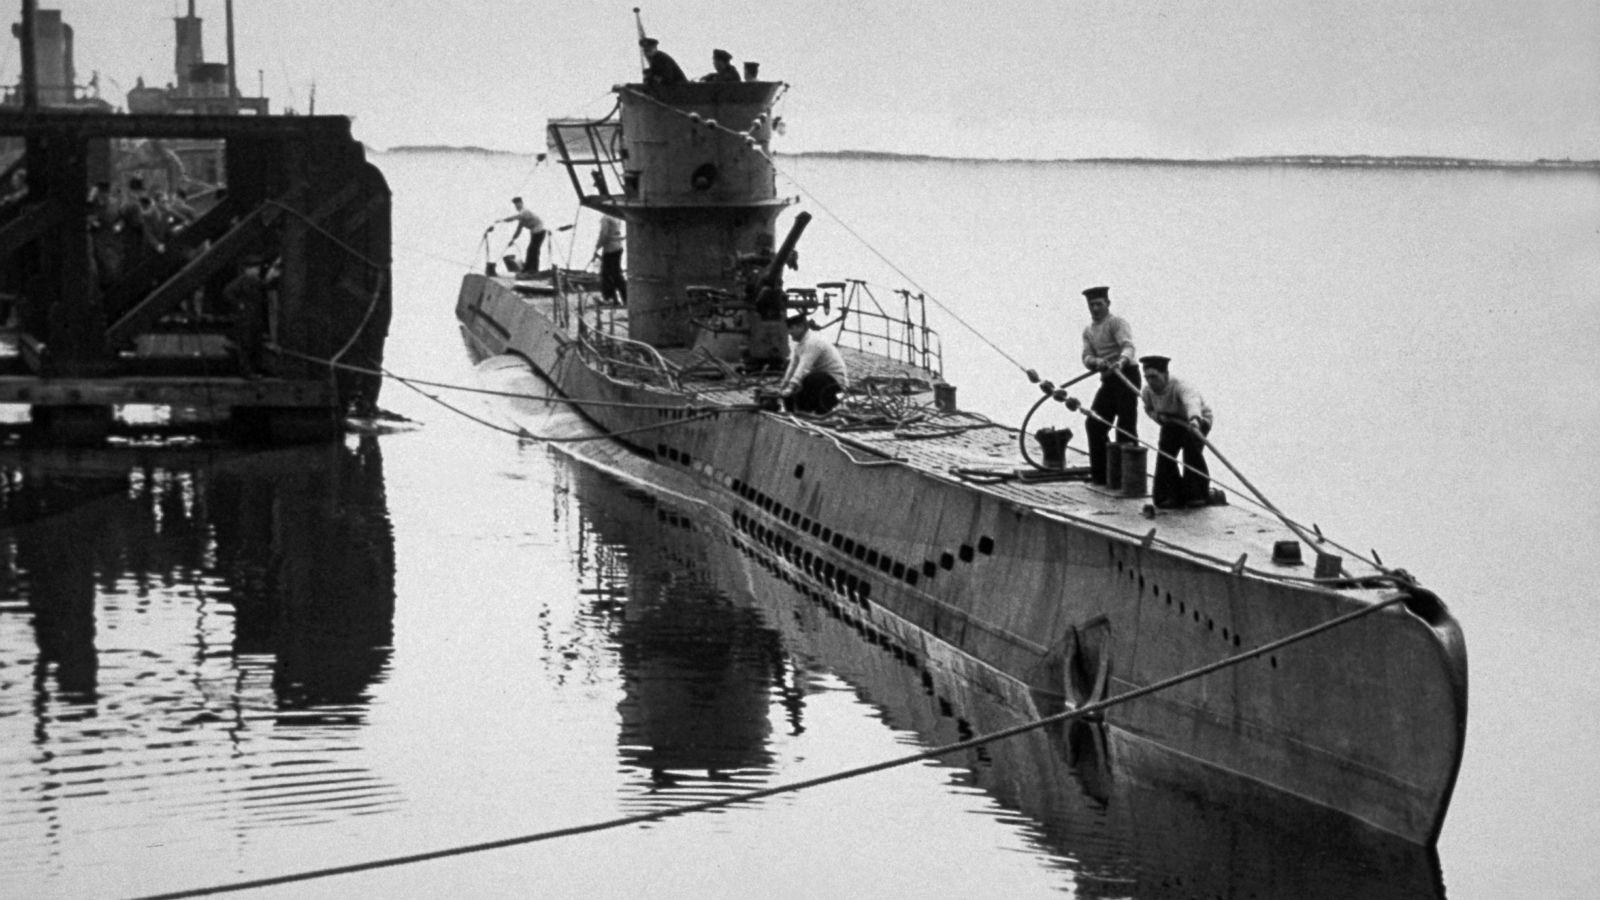 world war ii u-boat found with skeletons - abc news